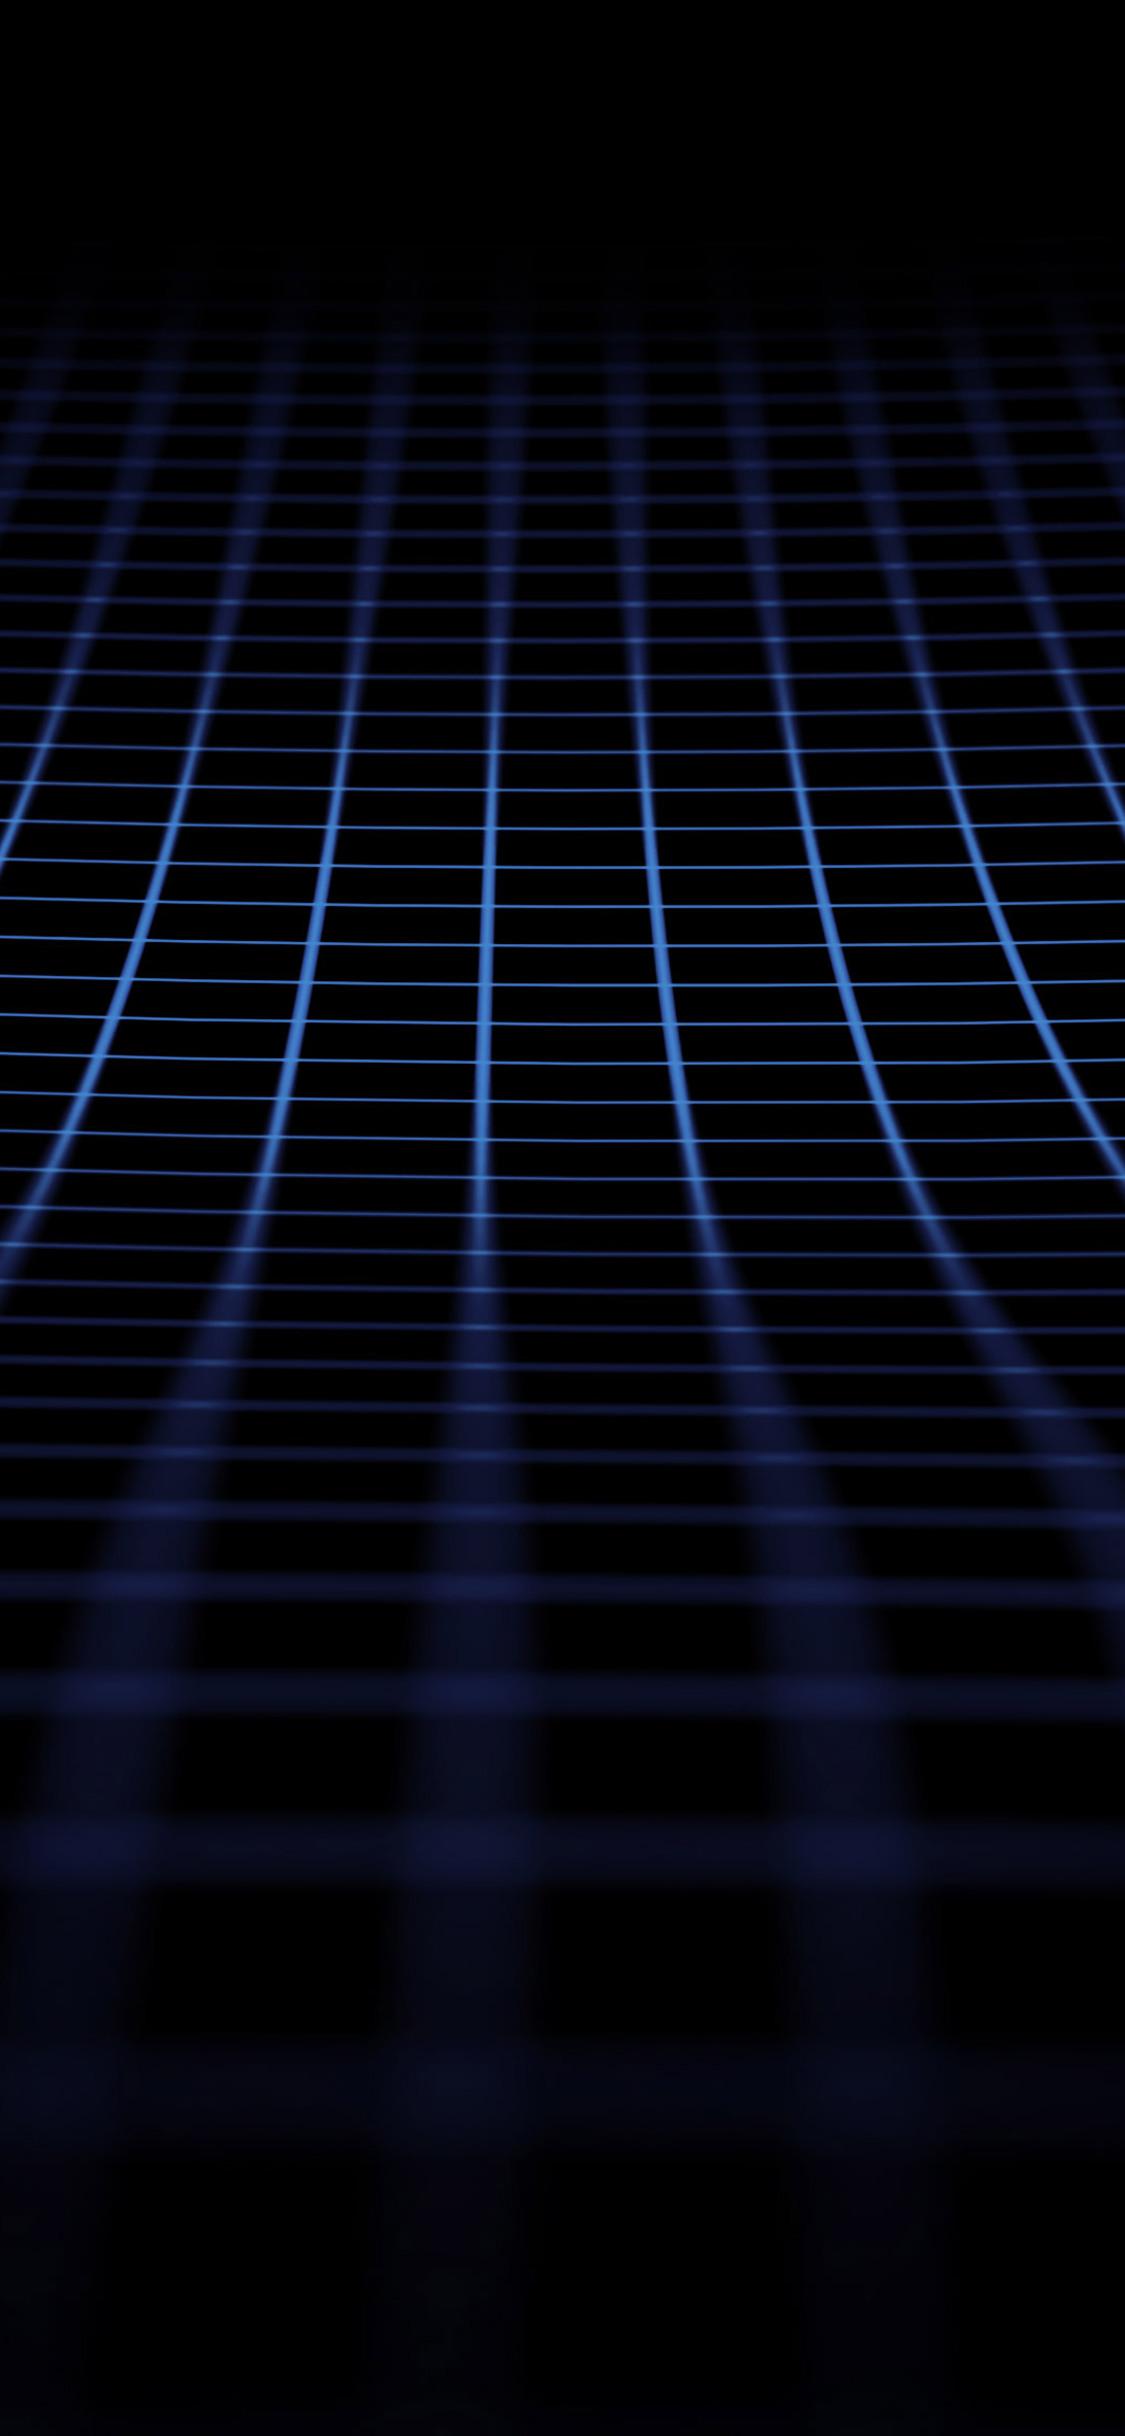 1125x2436 Blue Grid Waves Iphone Xs Iphone 10 Iphone X Hd 4k